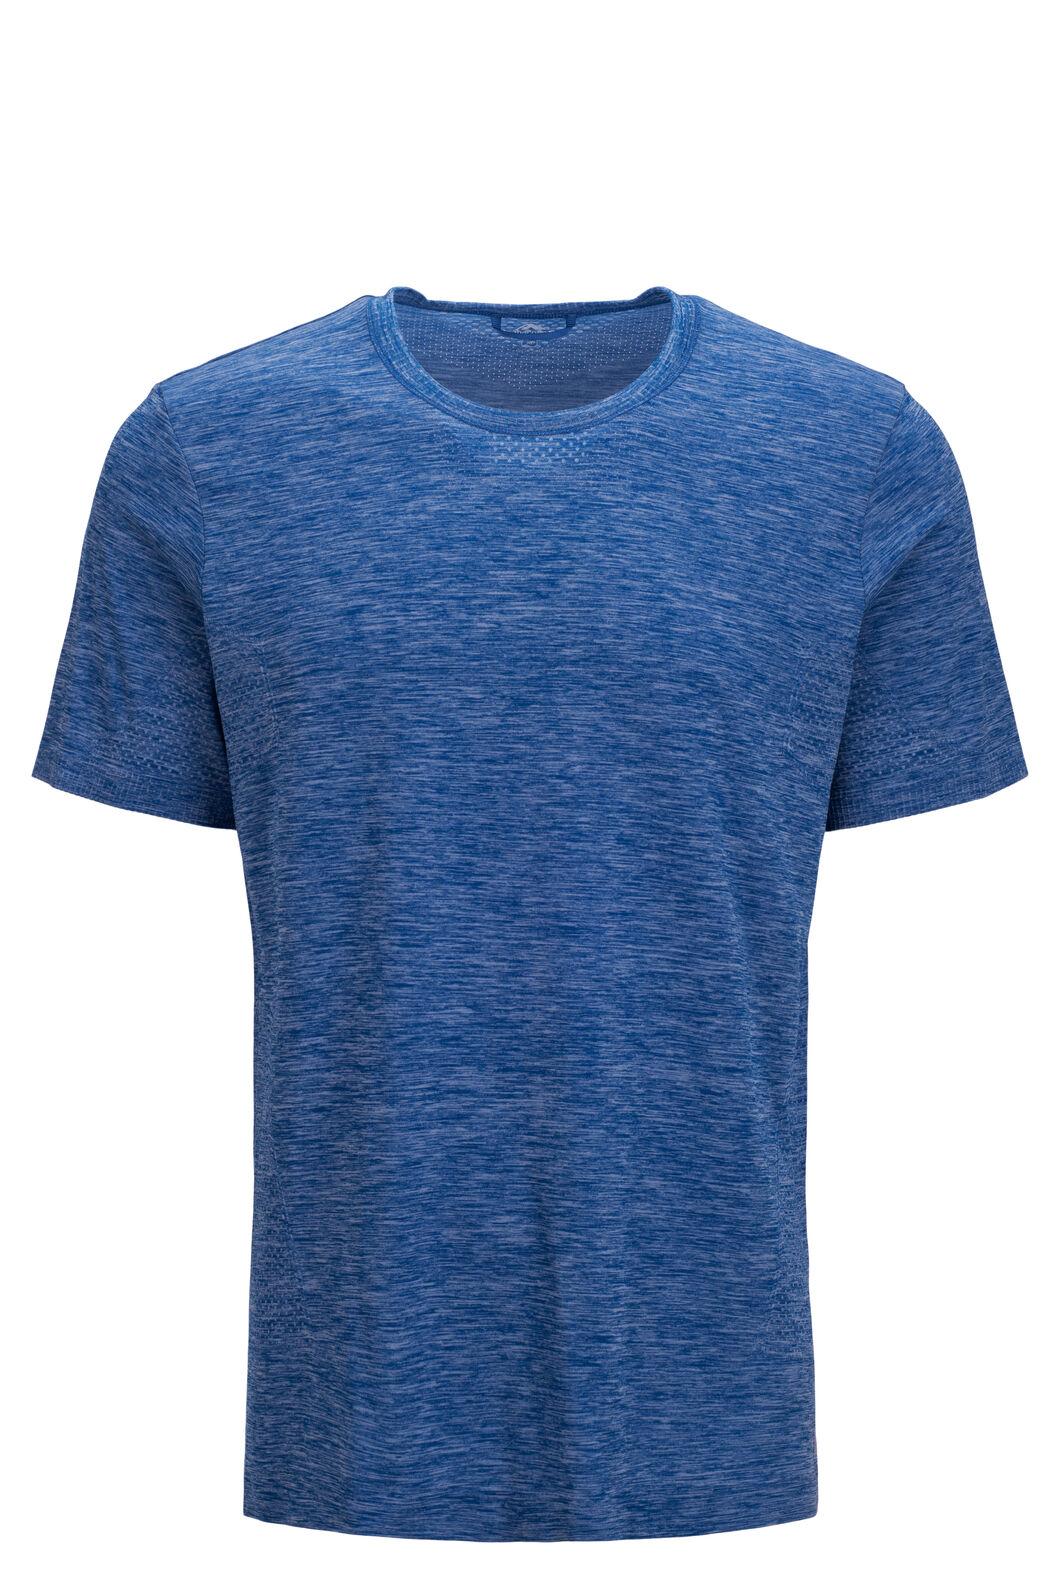 Macpac Limitless Short Sleeve Tee — Men's, Classic Blue, hi-res